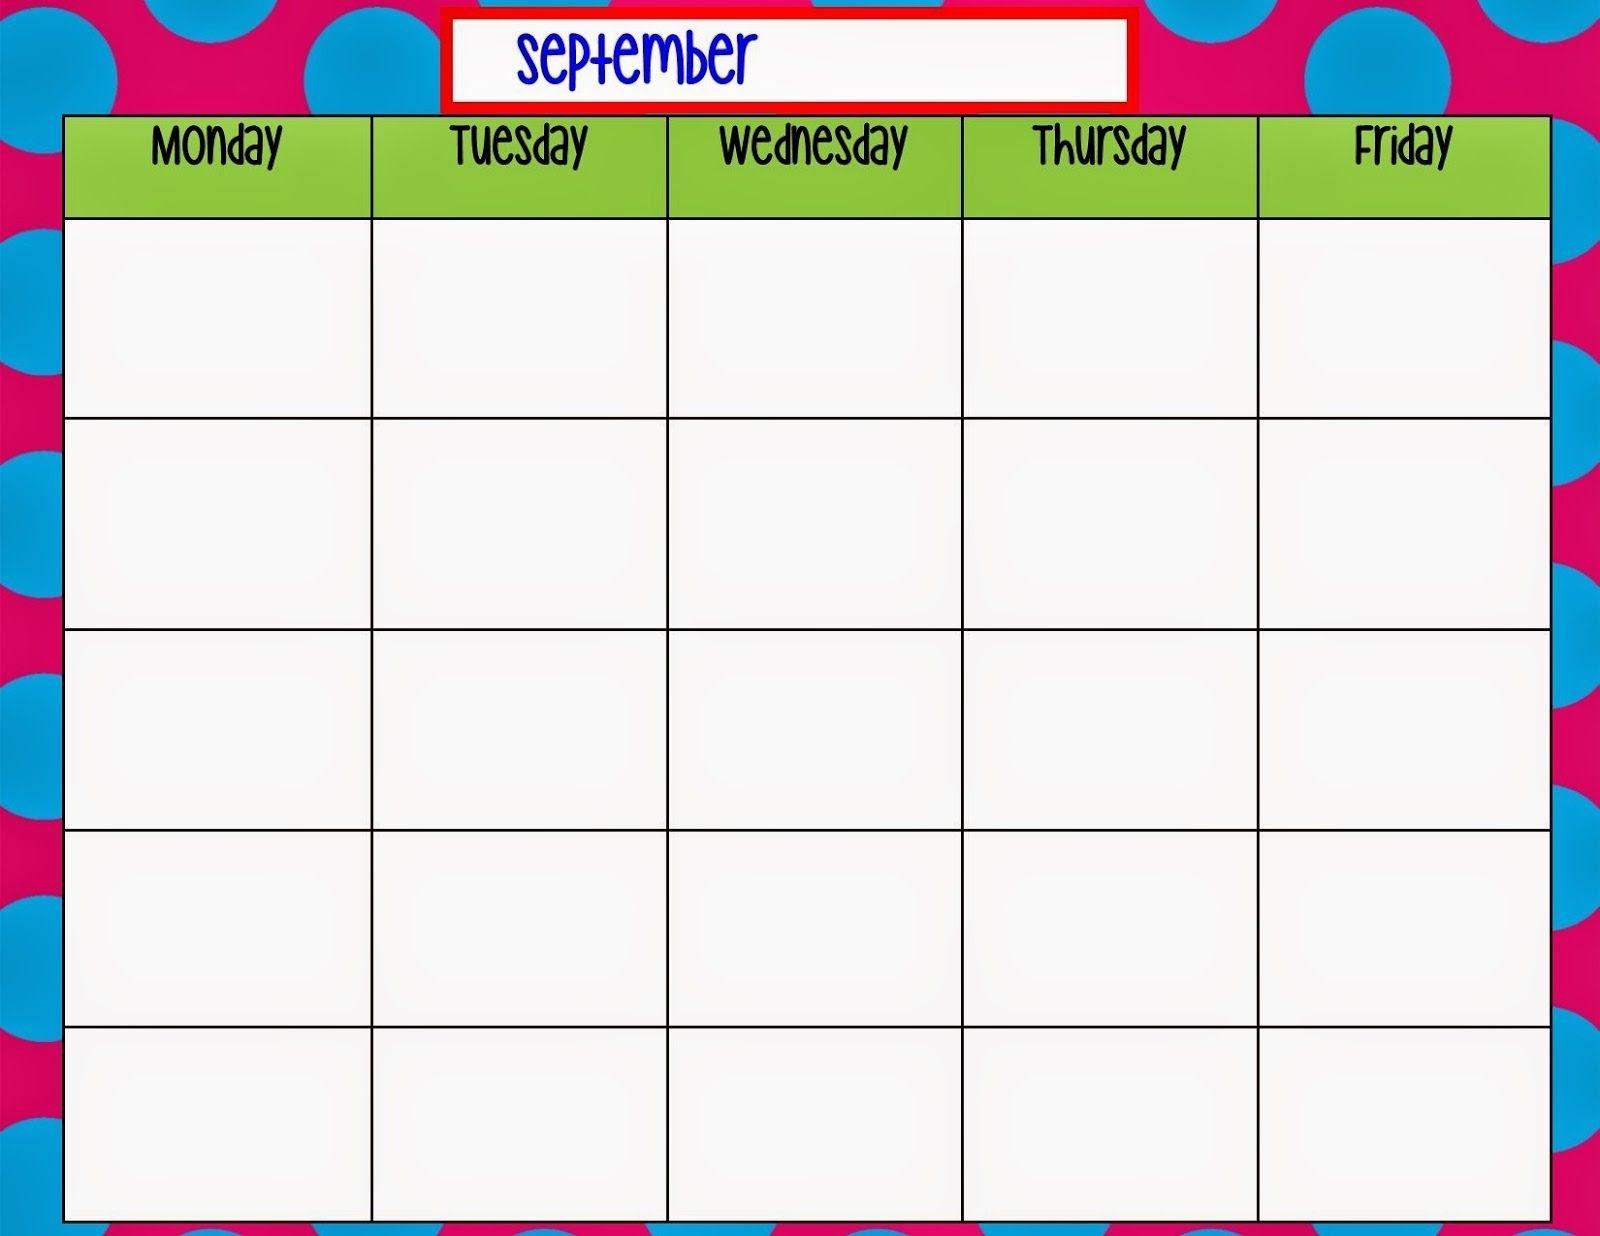 Monday Through Friday Calendar Template | Preschool | Printable for Printable Appointment Calendars Monday Through Friday